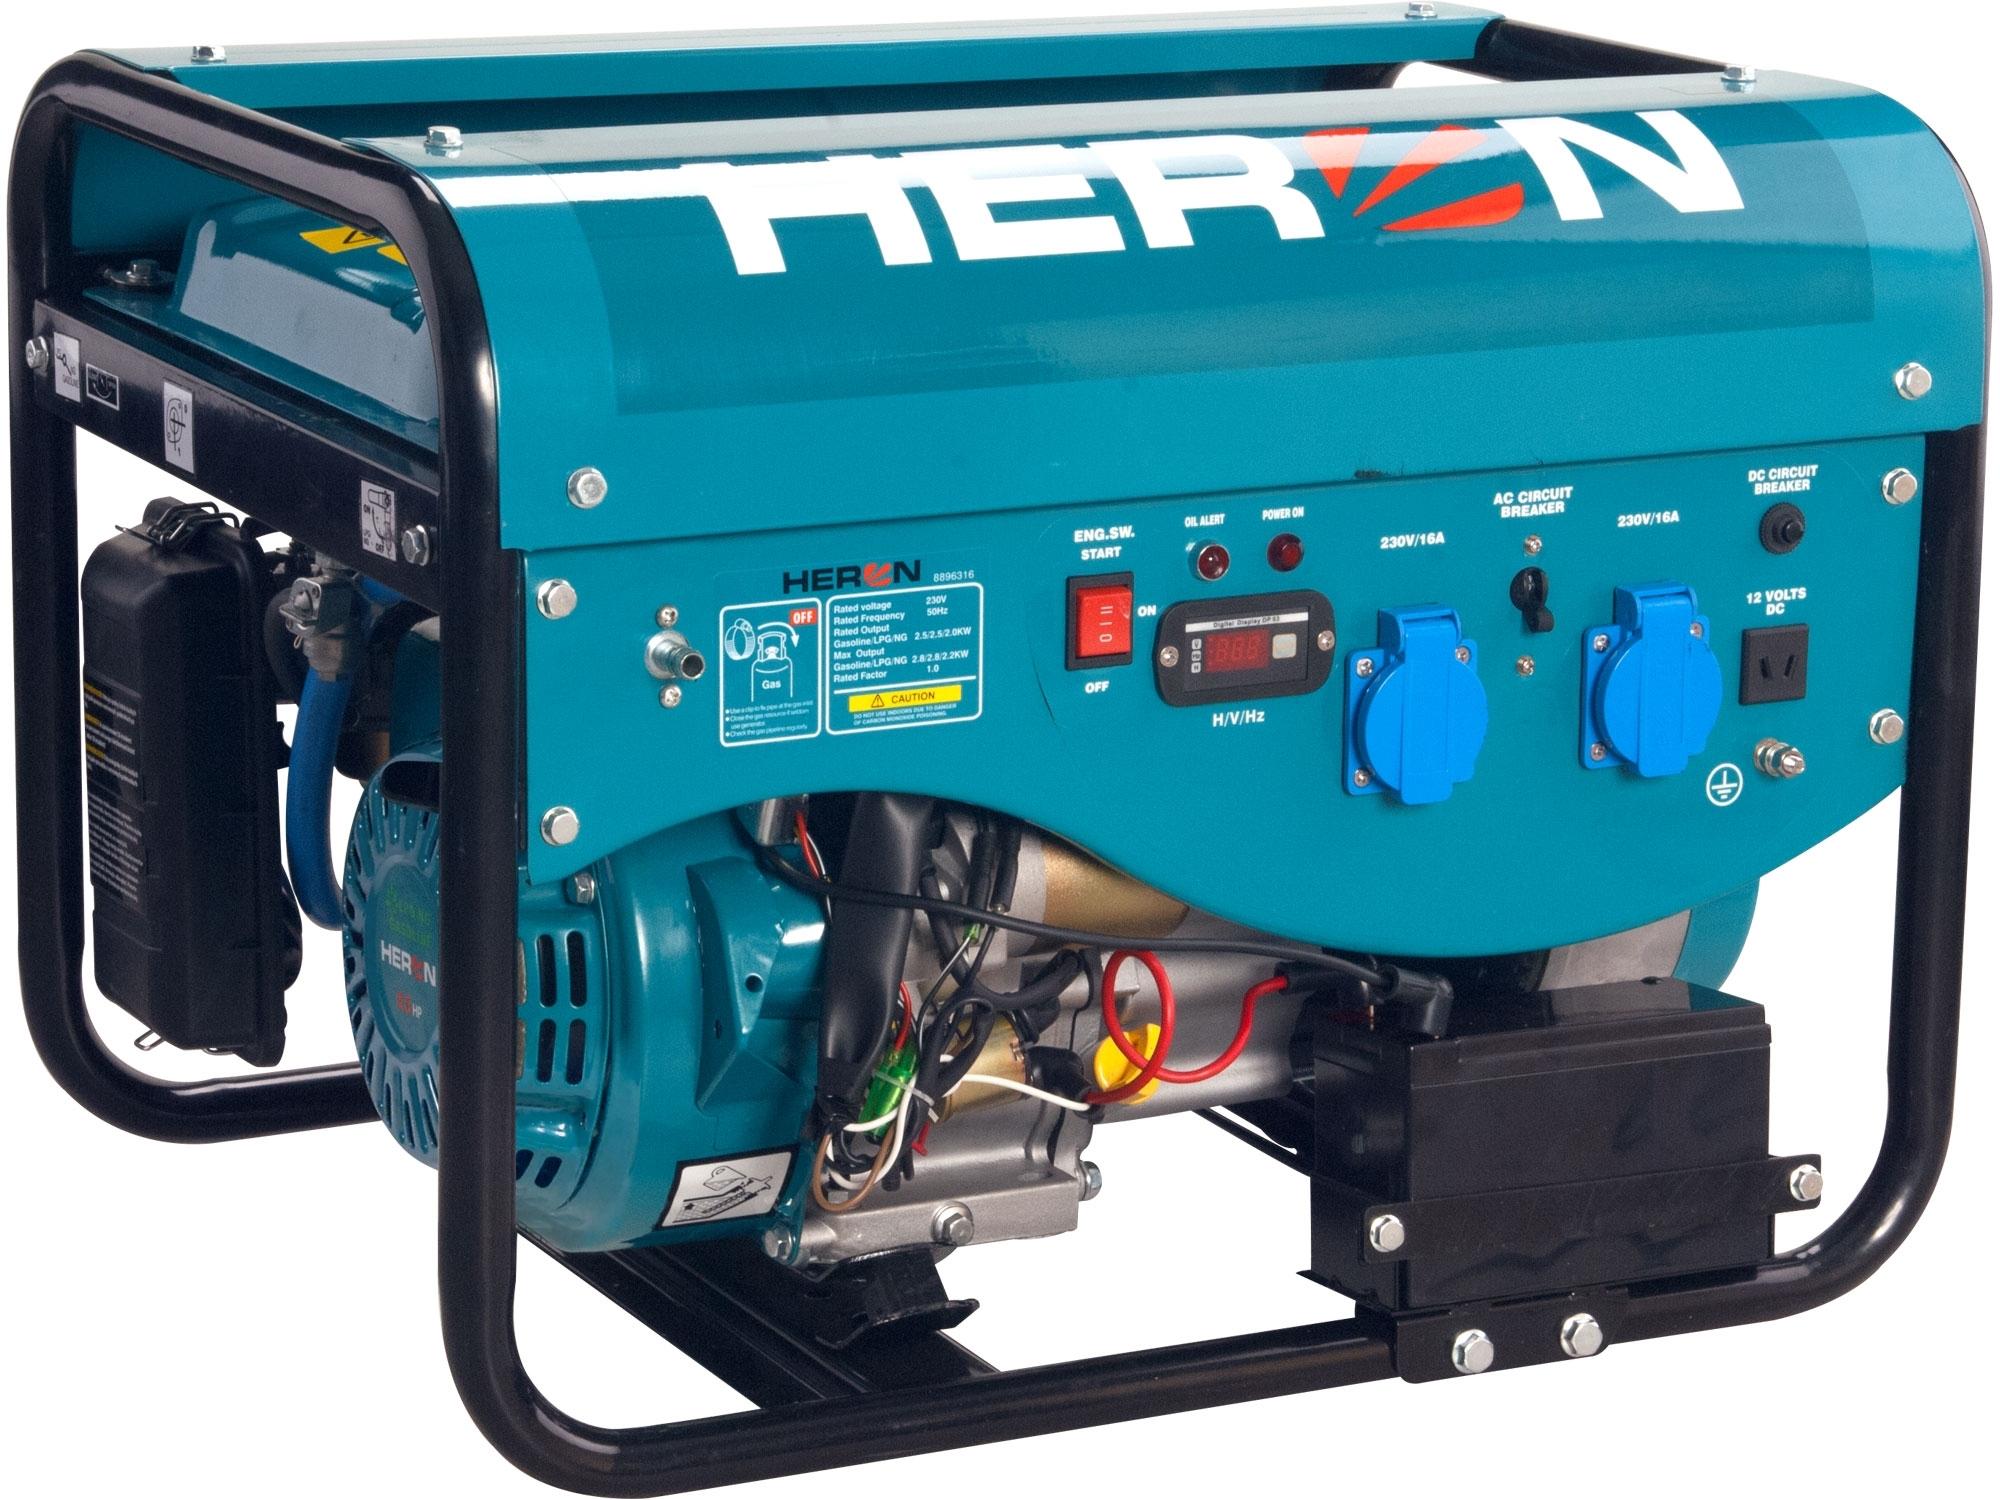 HERON elektrocentrála benzínová a plynová (LGP/NG) 6,3HP/2,4kW, elektrický start